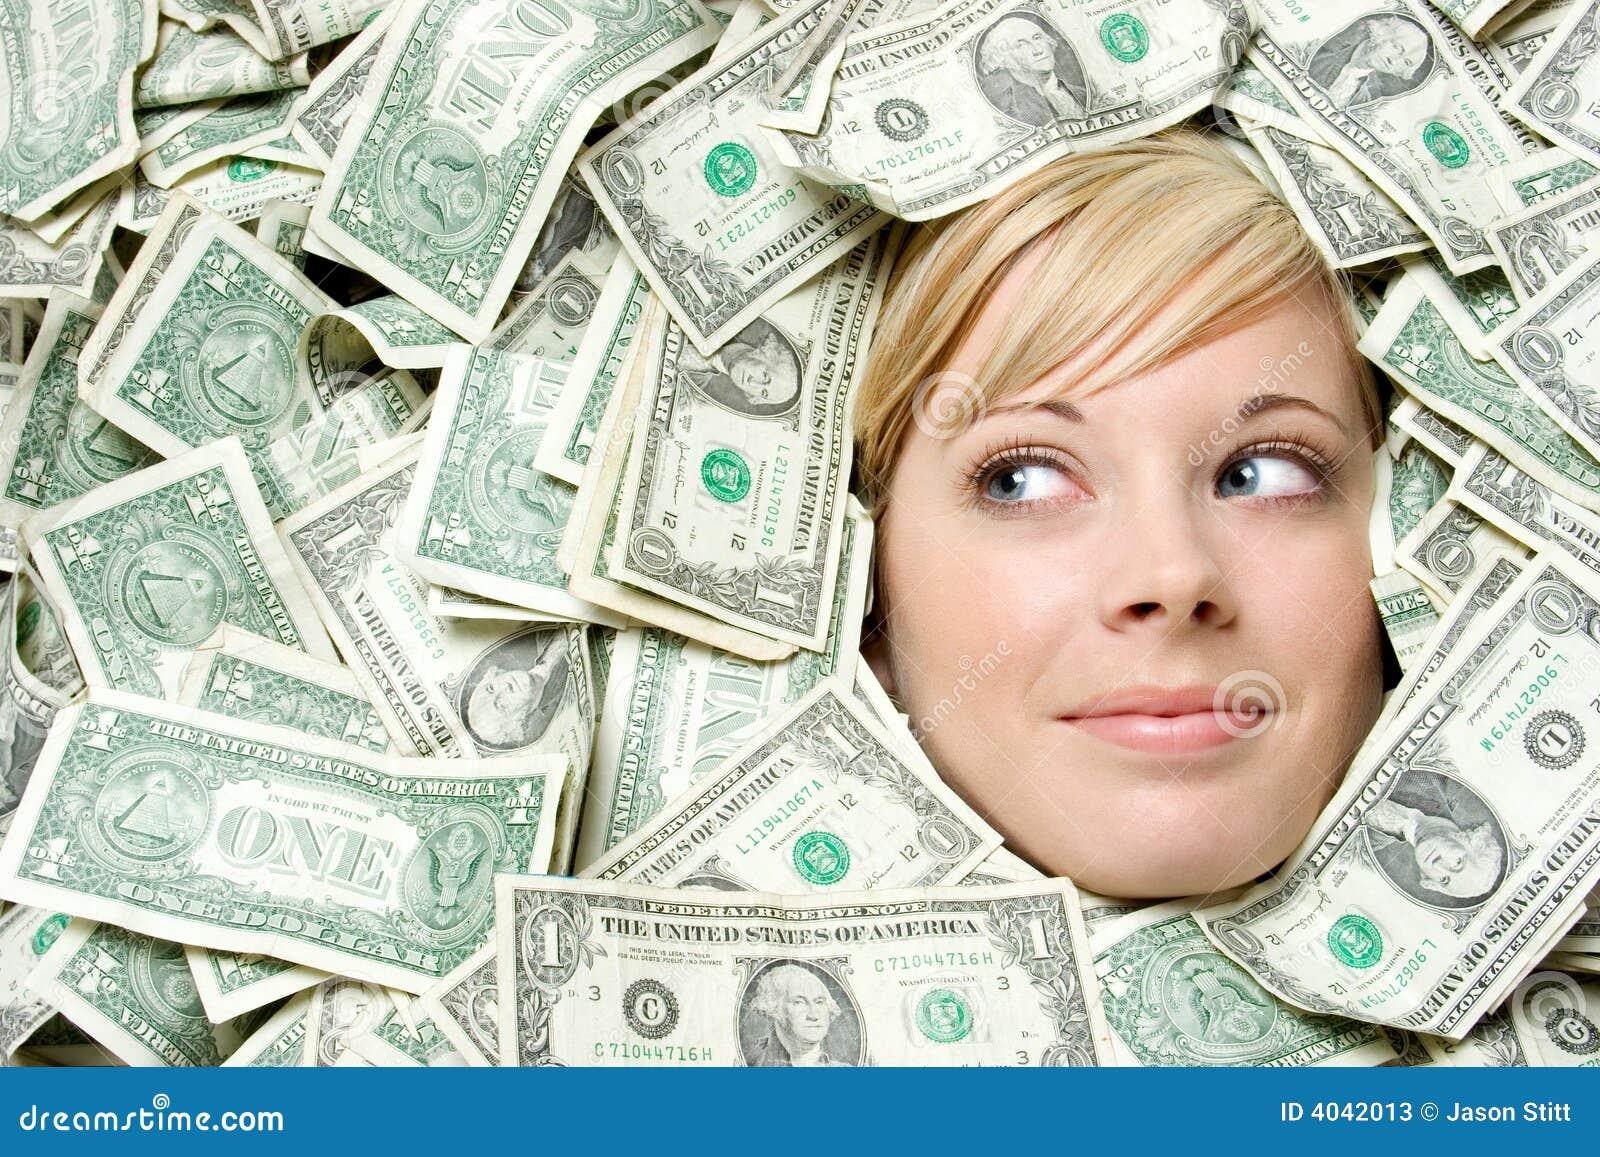 Face in Money